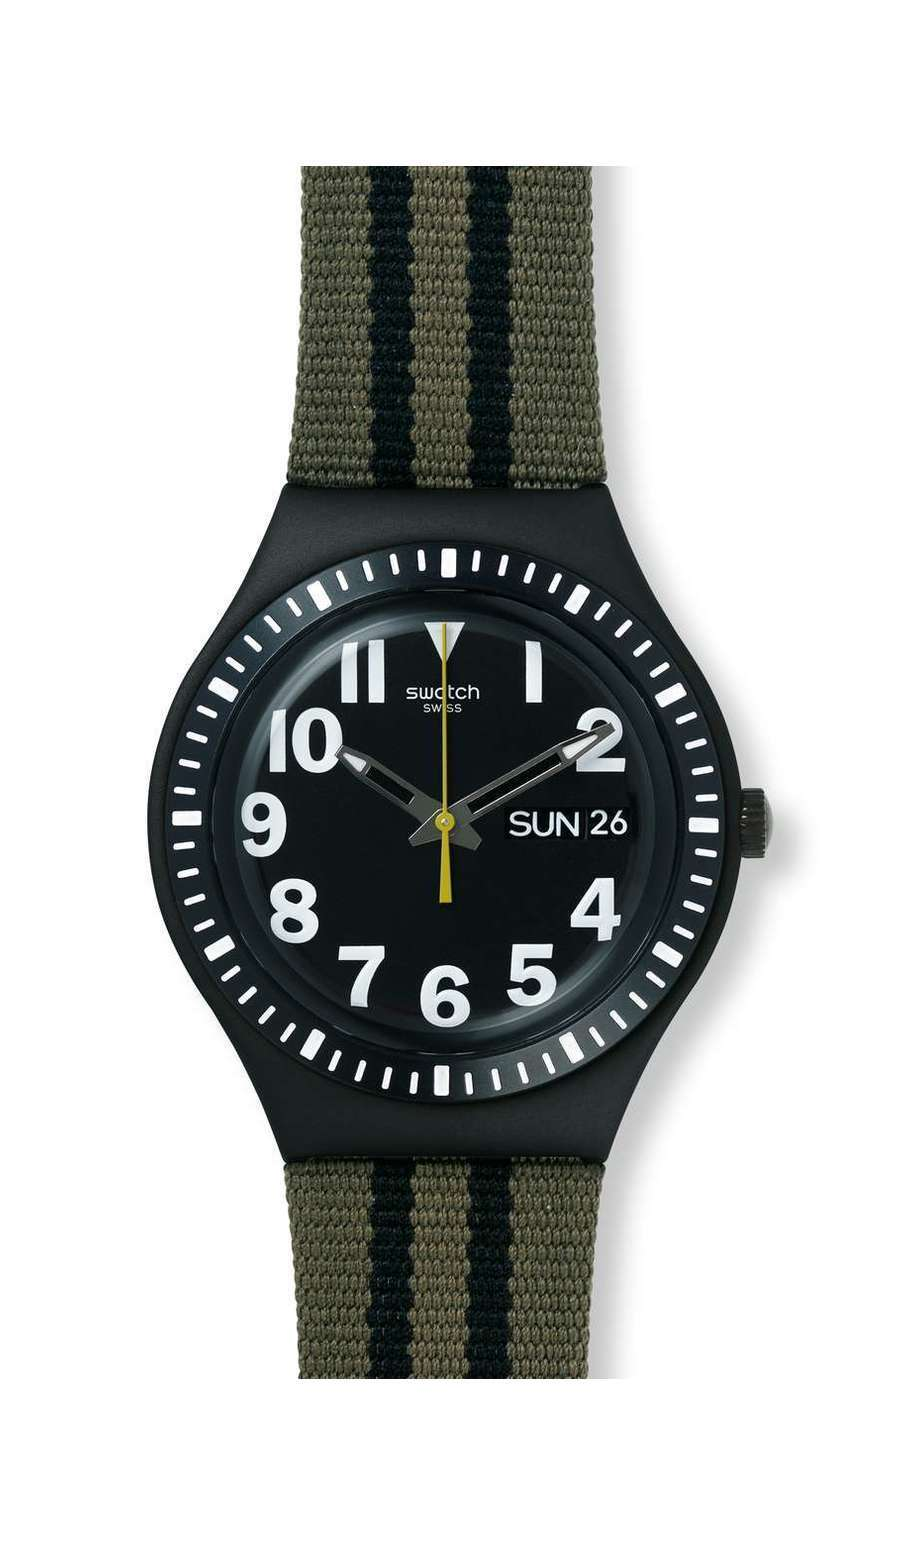 Swatch - THE CAPT - 1